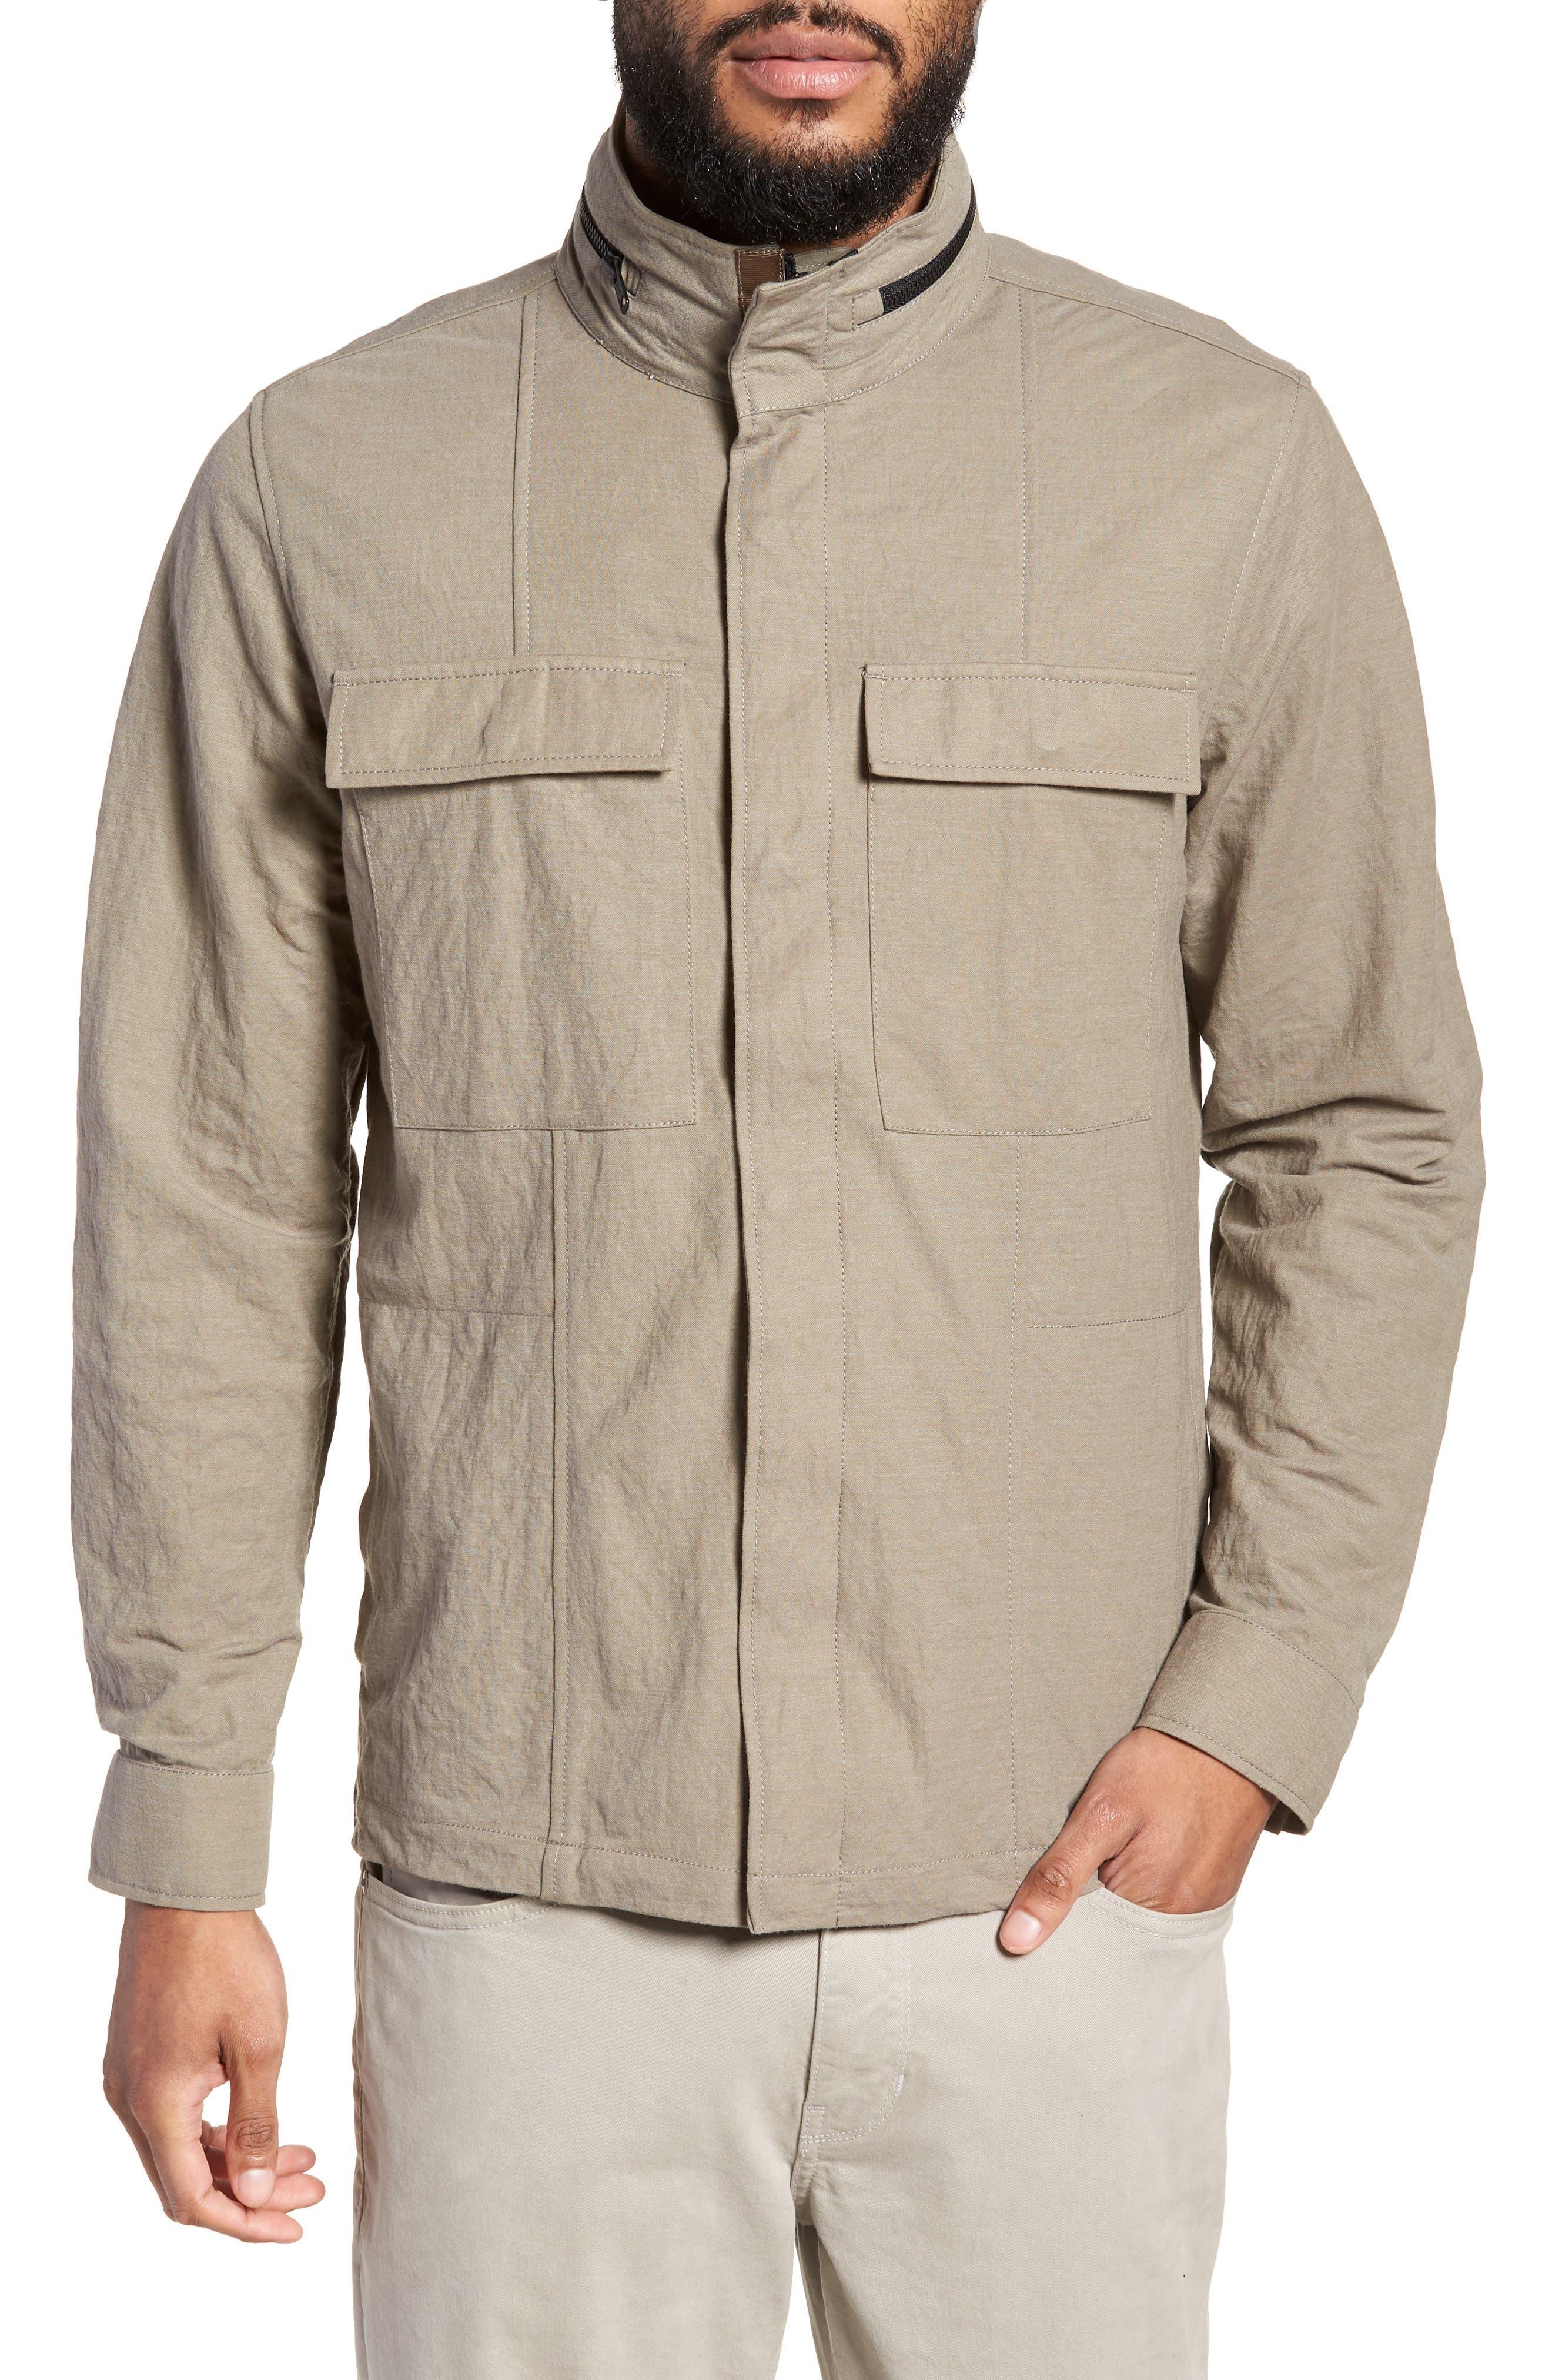 Trim Fit Jacket,                             Alternate thumbnail 4, color,                             Taupe